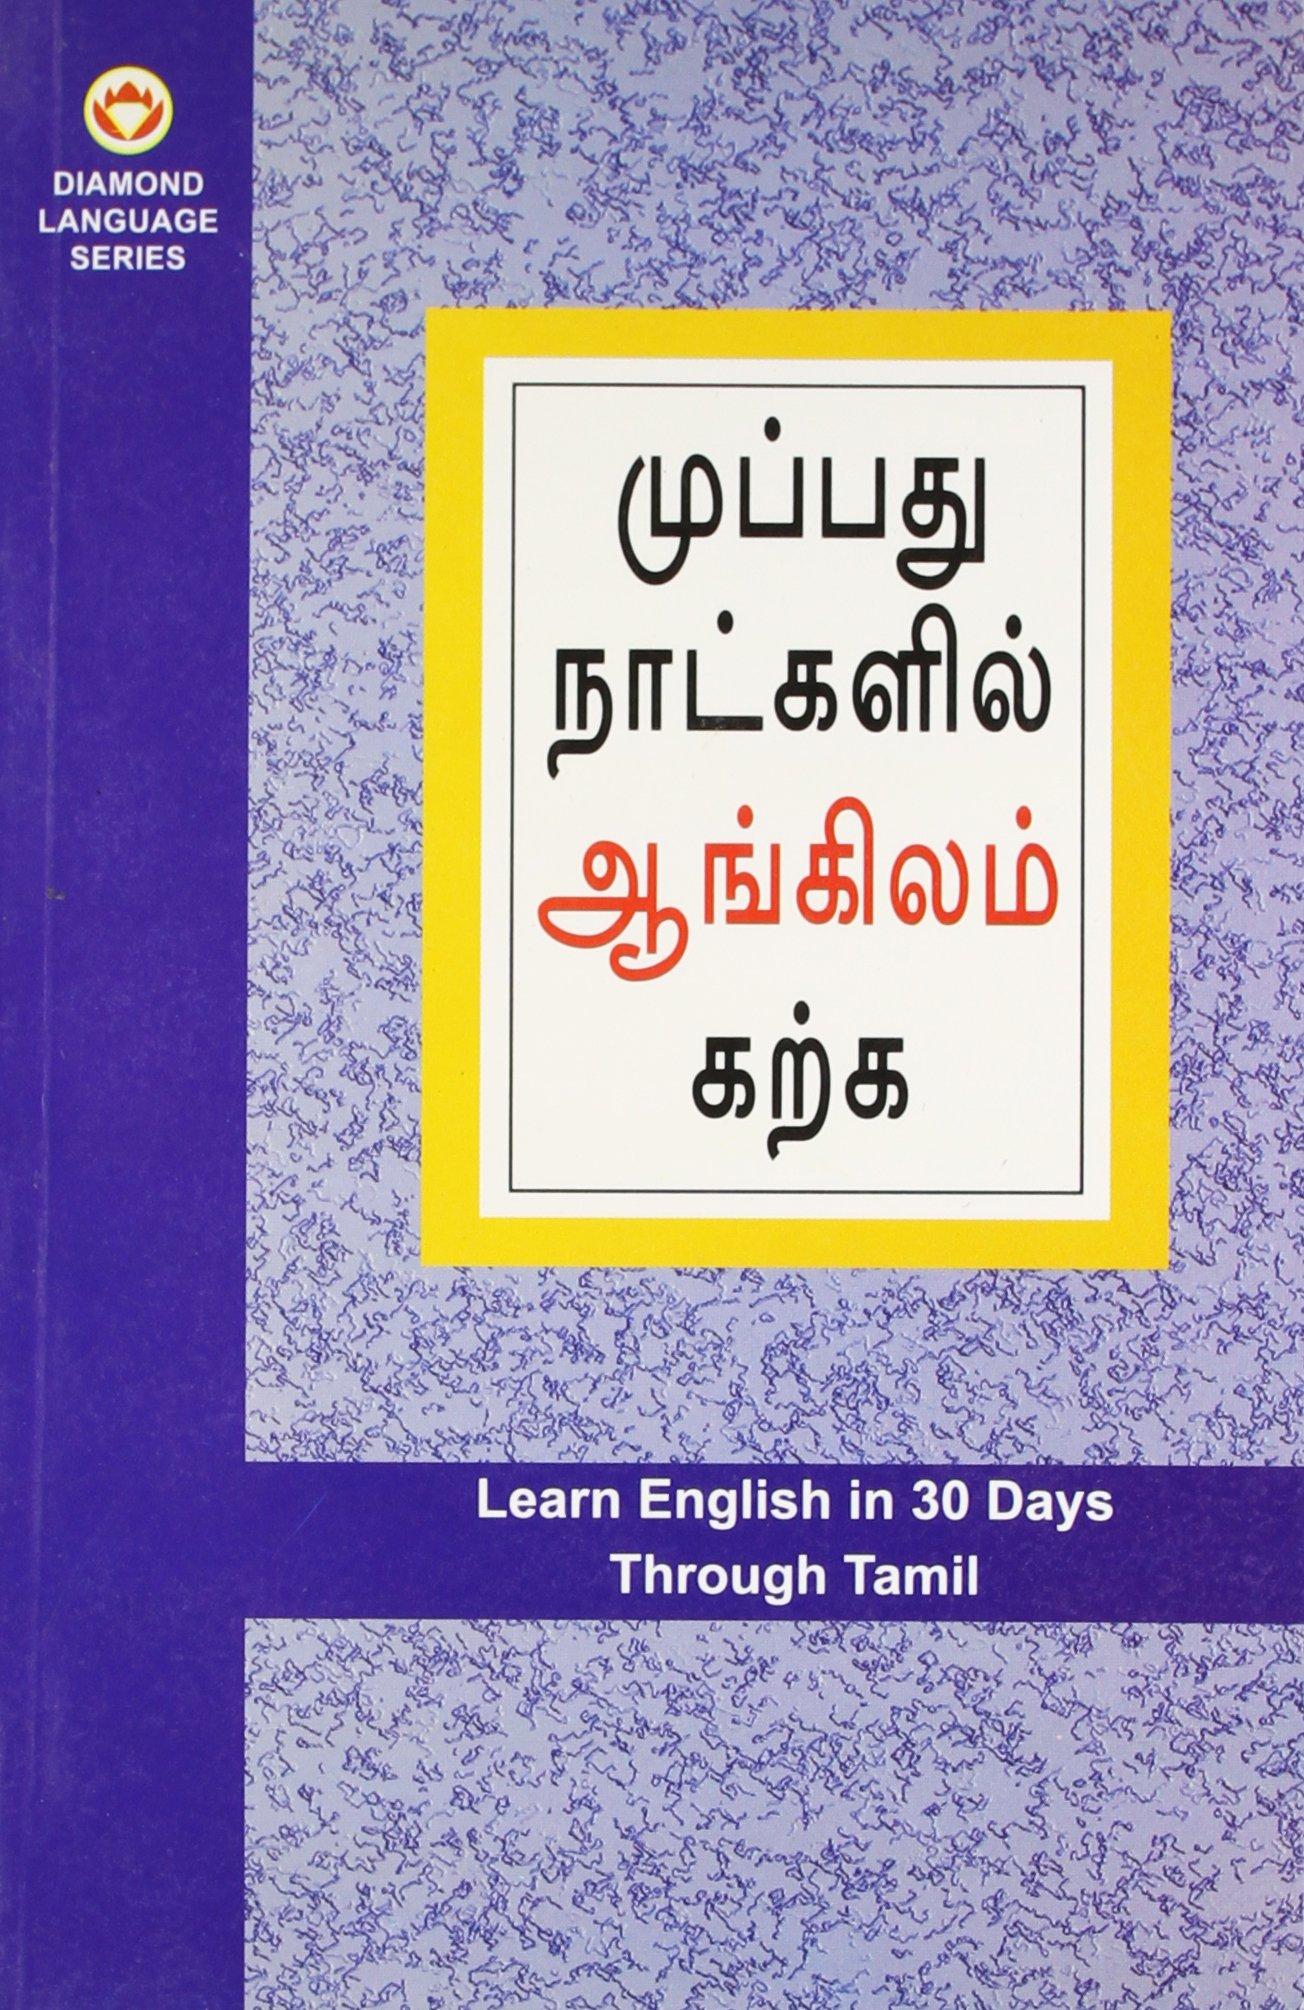 Hindi Language Learning Pdf